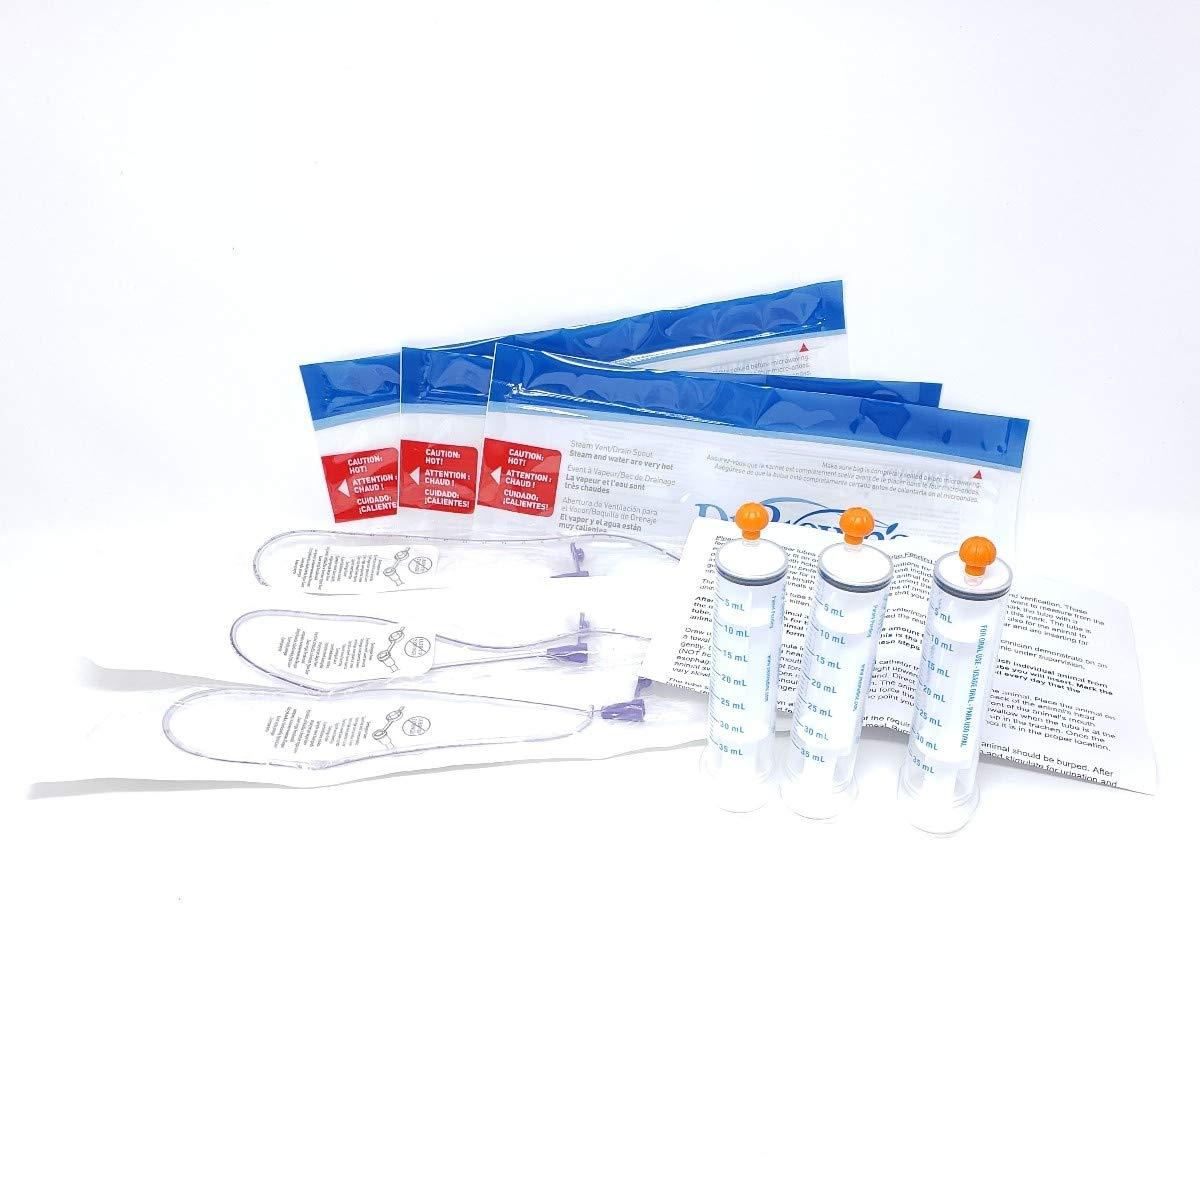 Lifeline 8Fr Clear Tube Feeding Kit - 3 Part by Lifeline Pet Supplies